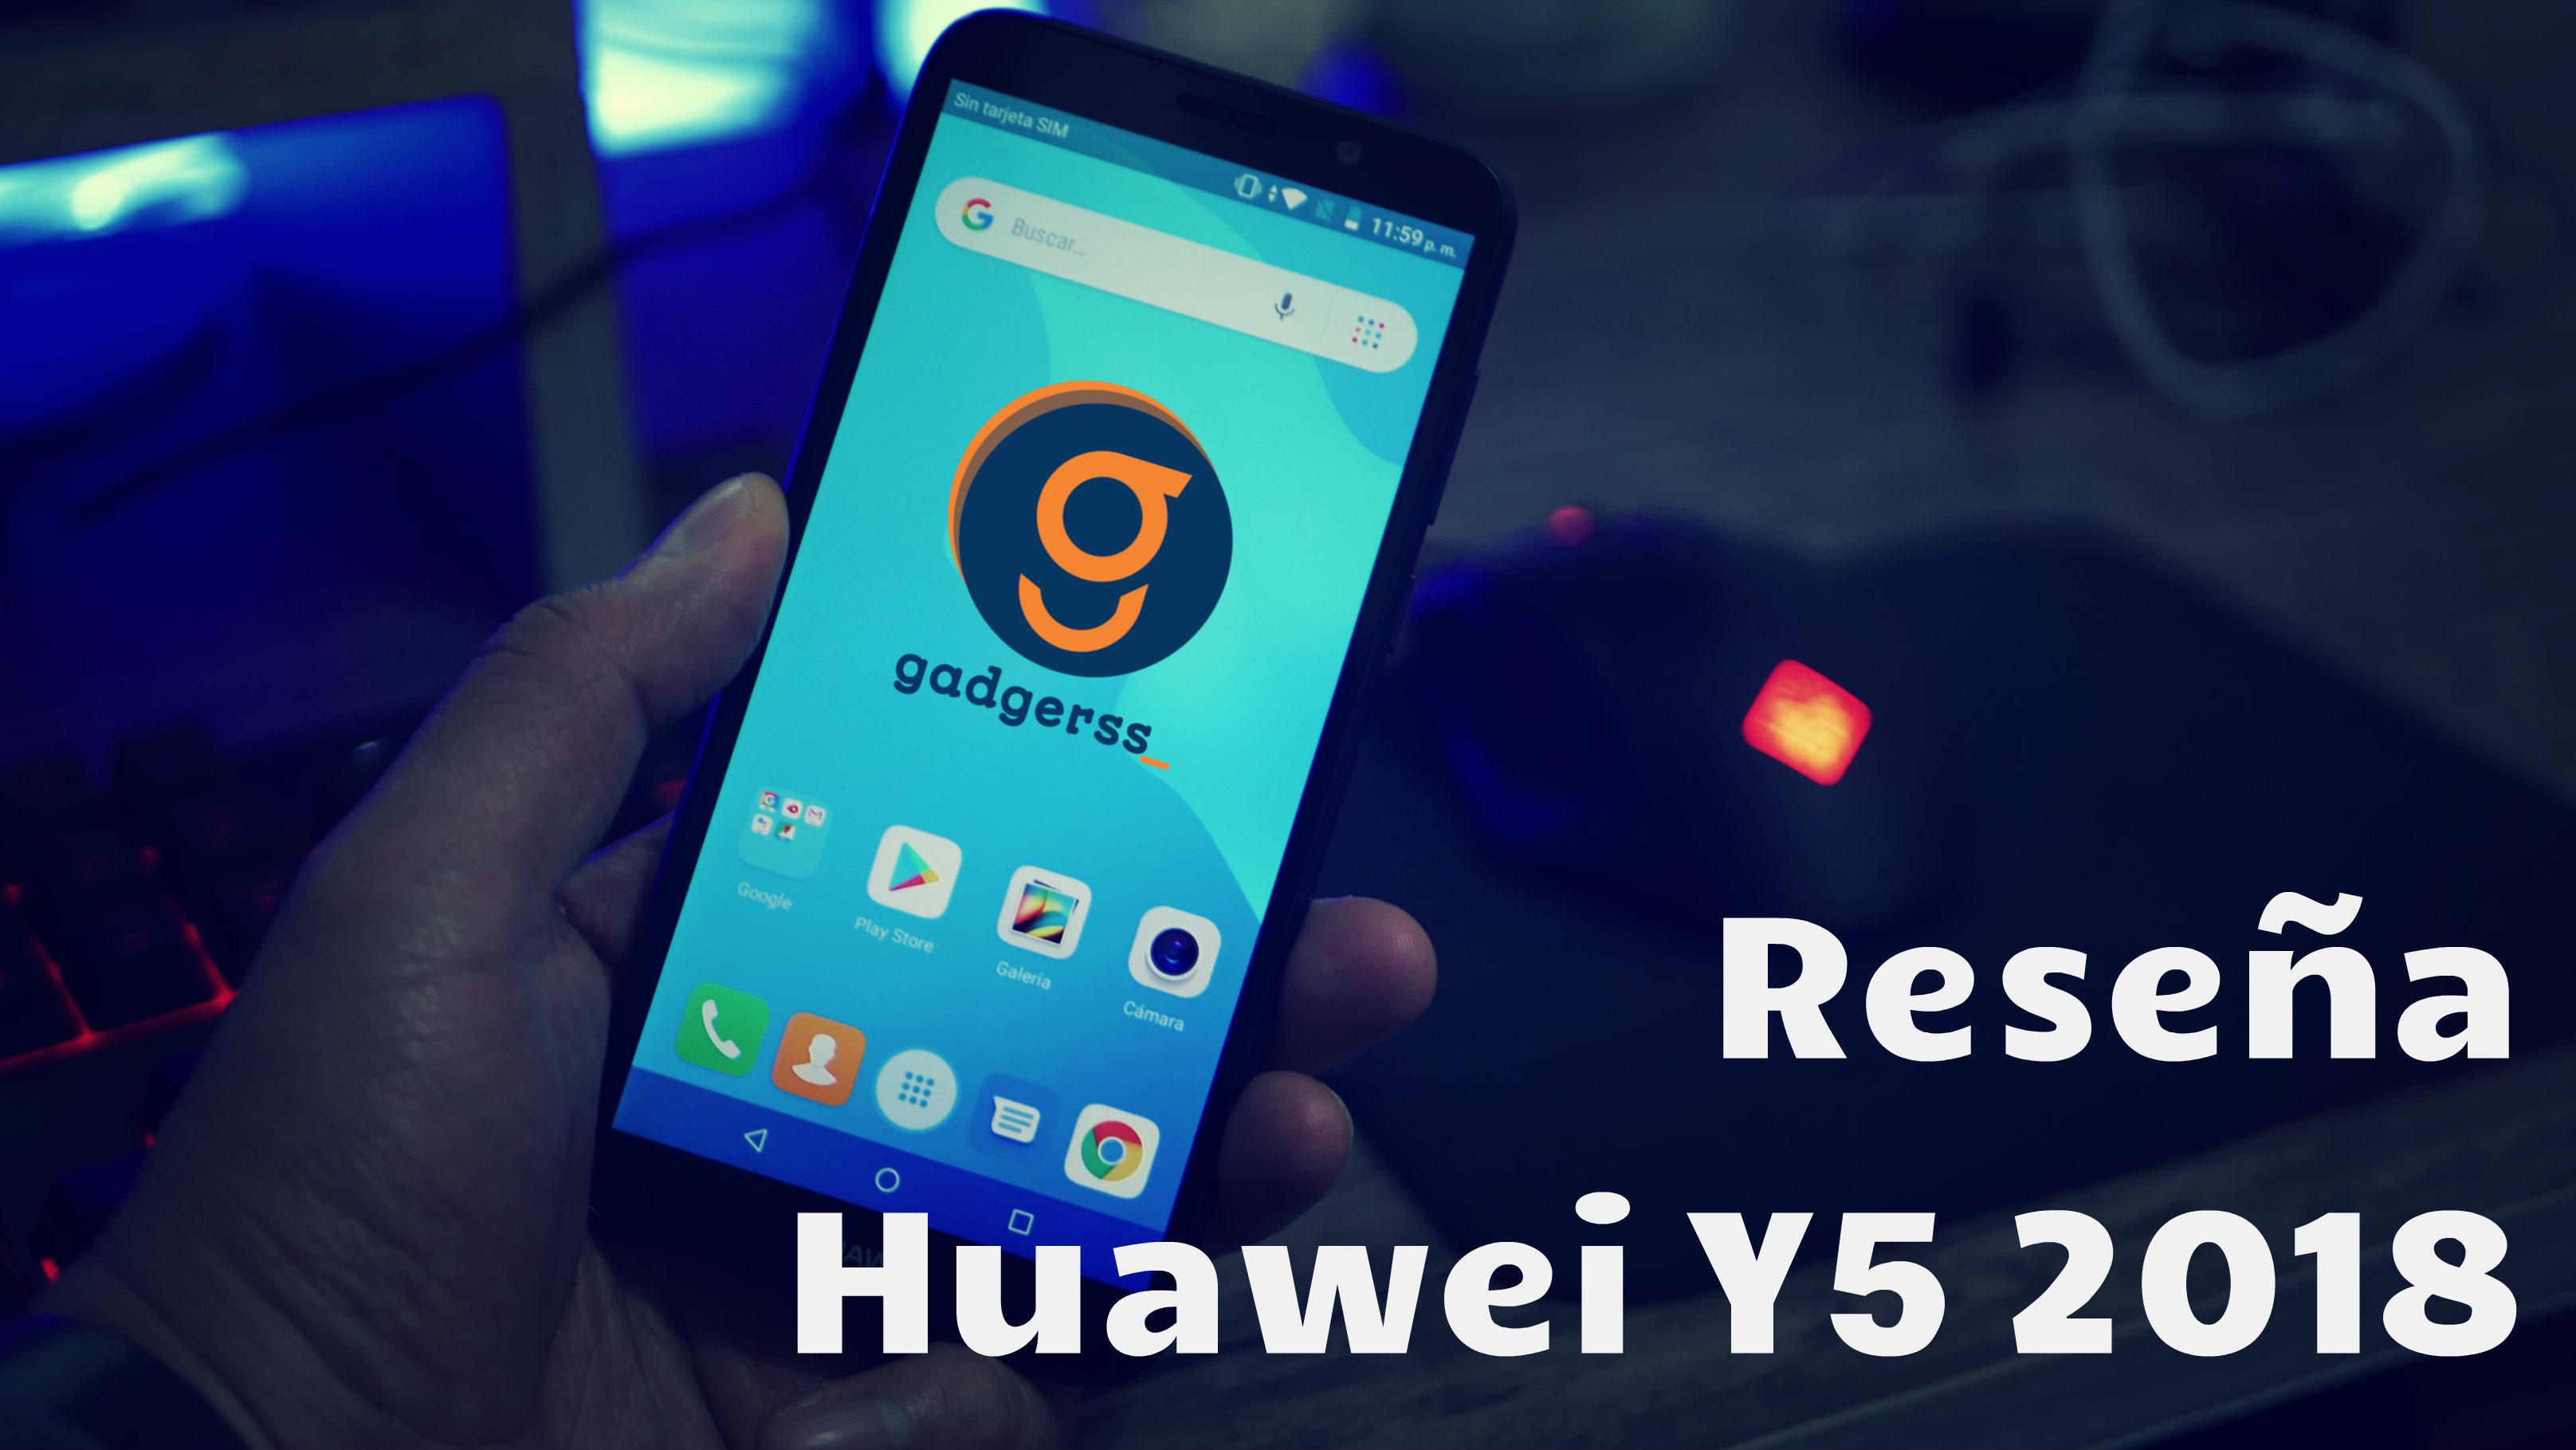 7708ce1f9a502 Reseña del Huawei Y5 2018 (Review en español) - Gadgerss